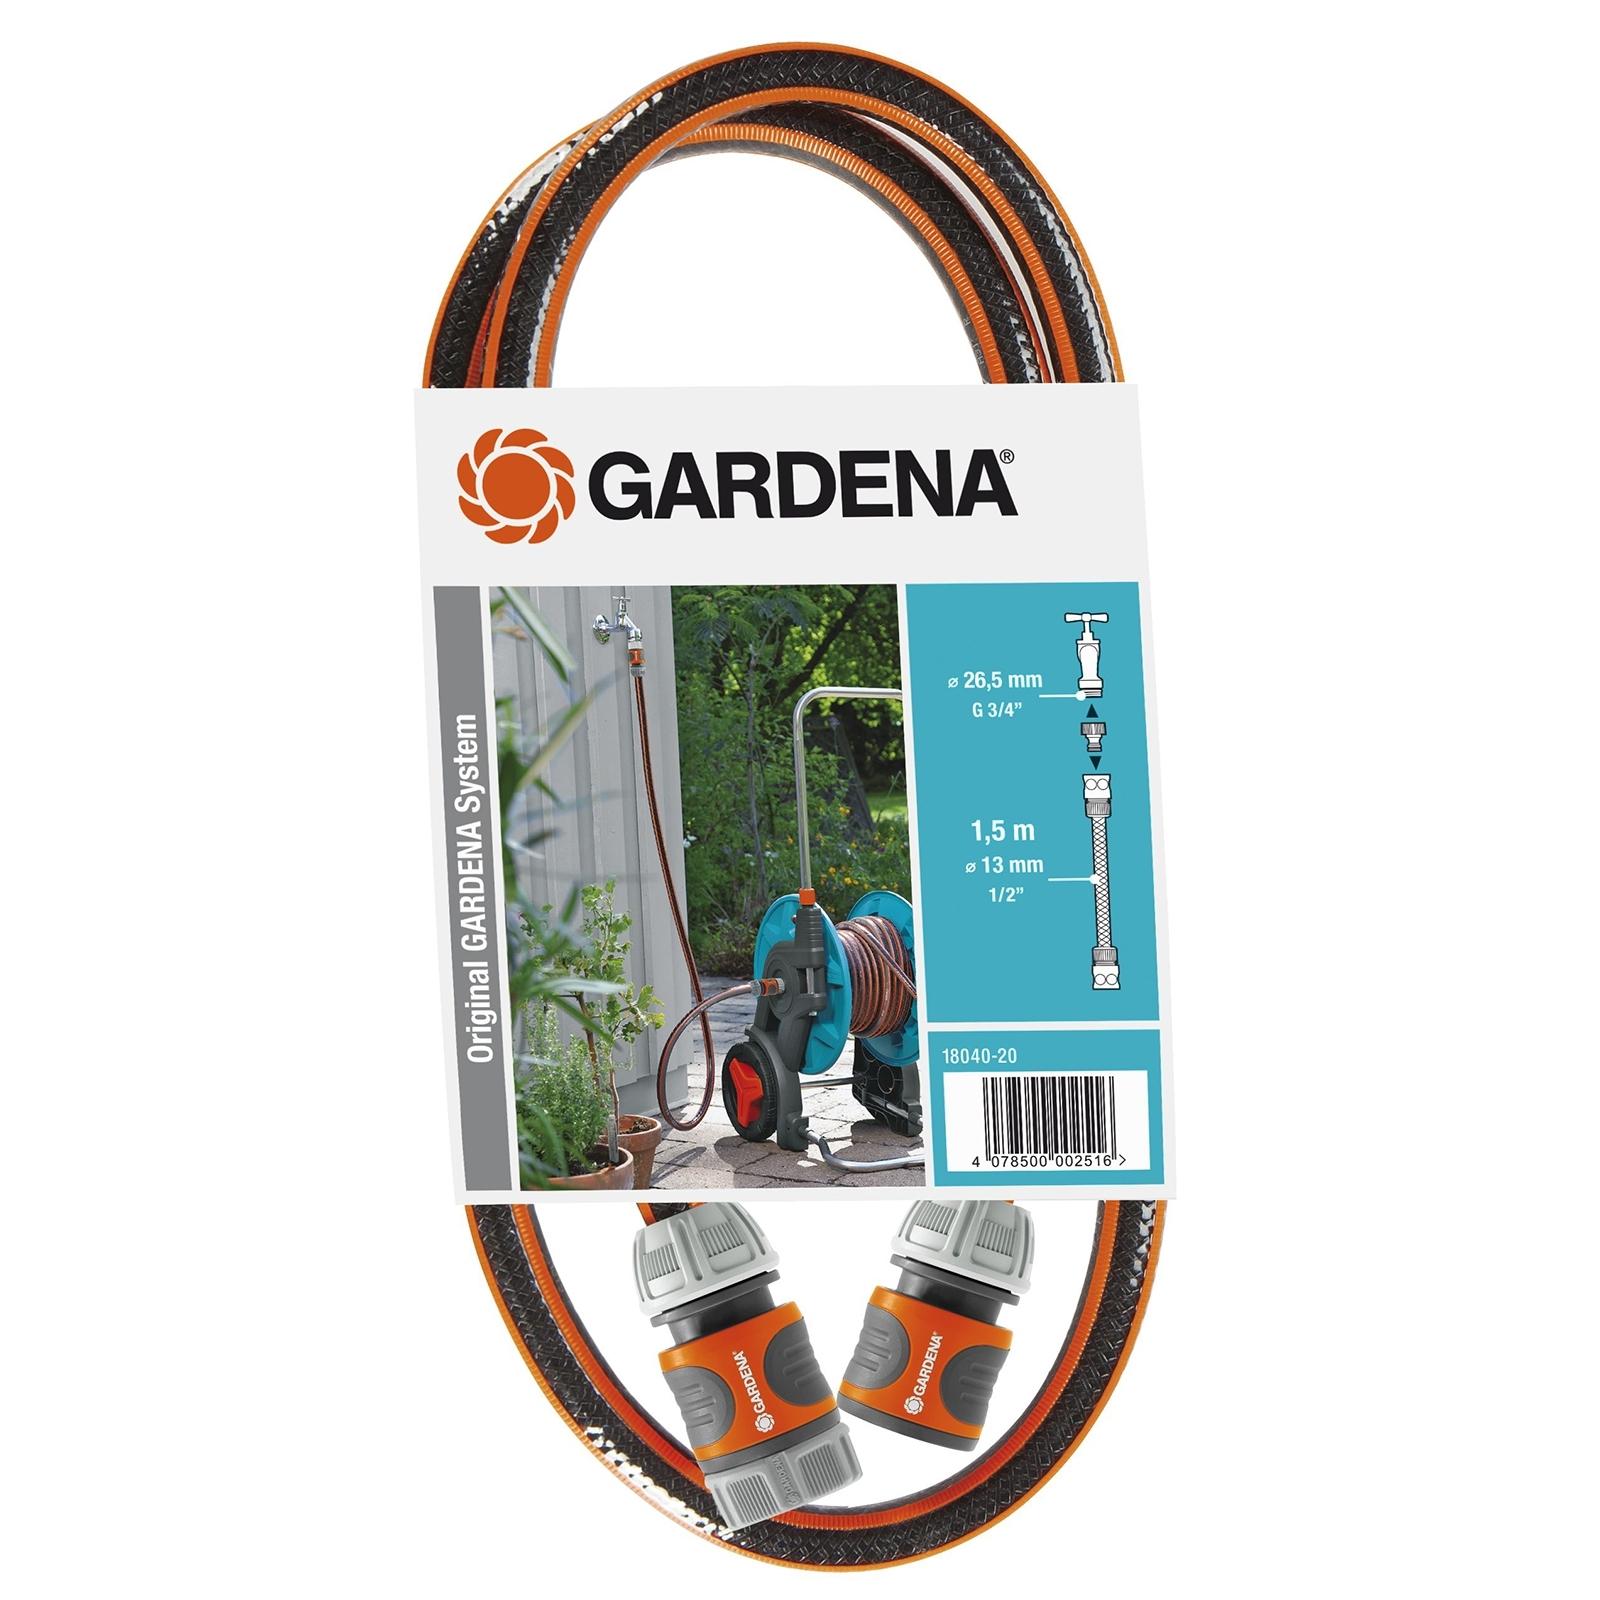 GARDENA 1.5m Tap To Reel Connection Set